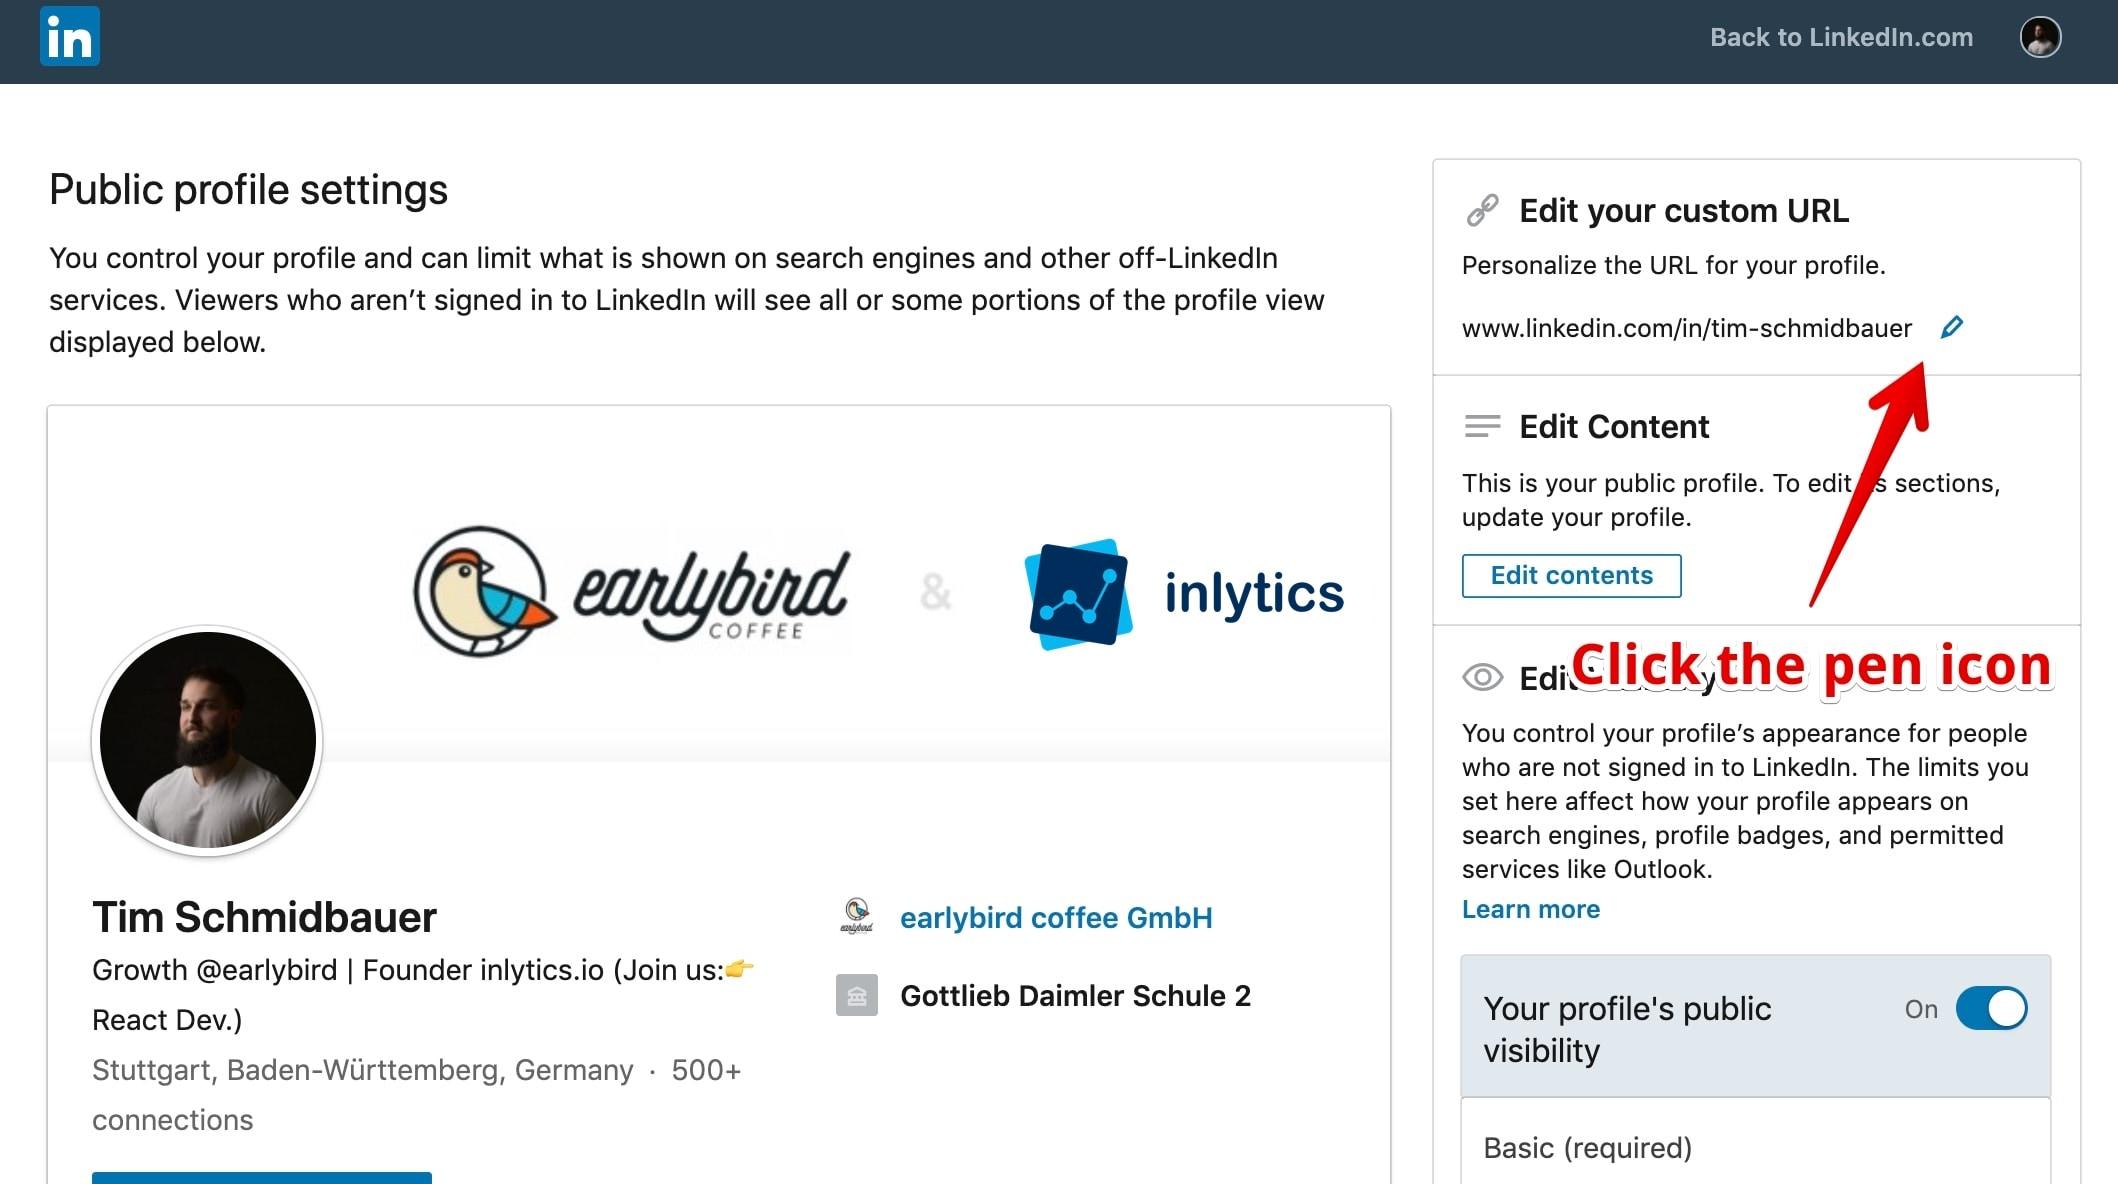 LinkedIn profile url customization - edit url by clicking the pen icon